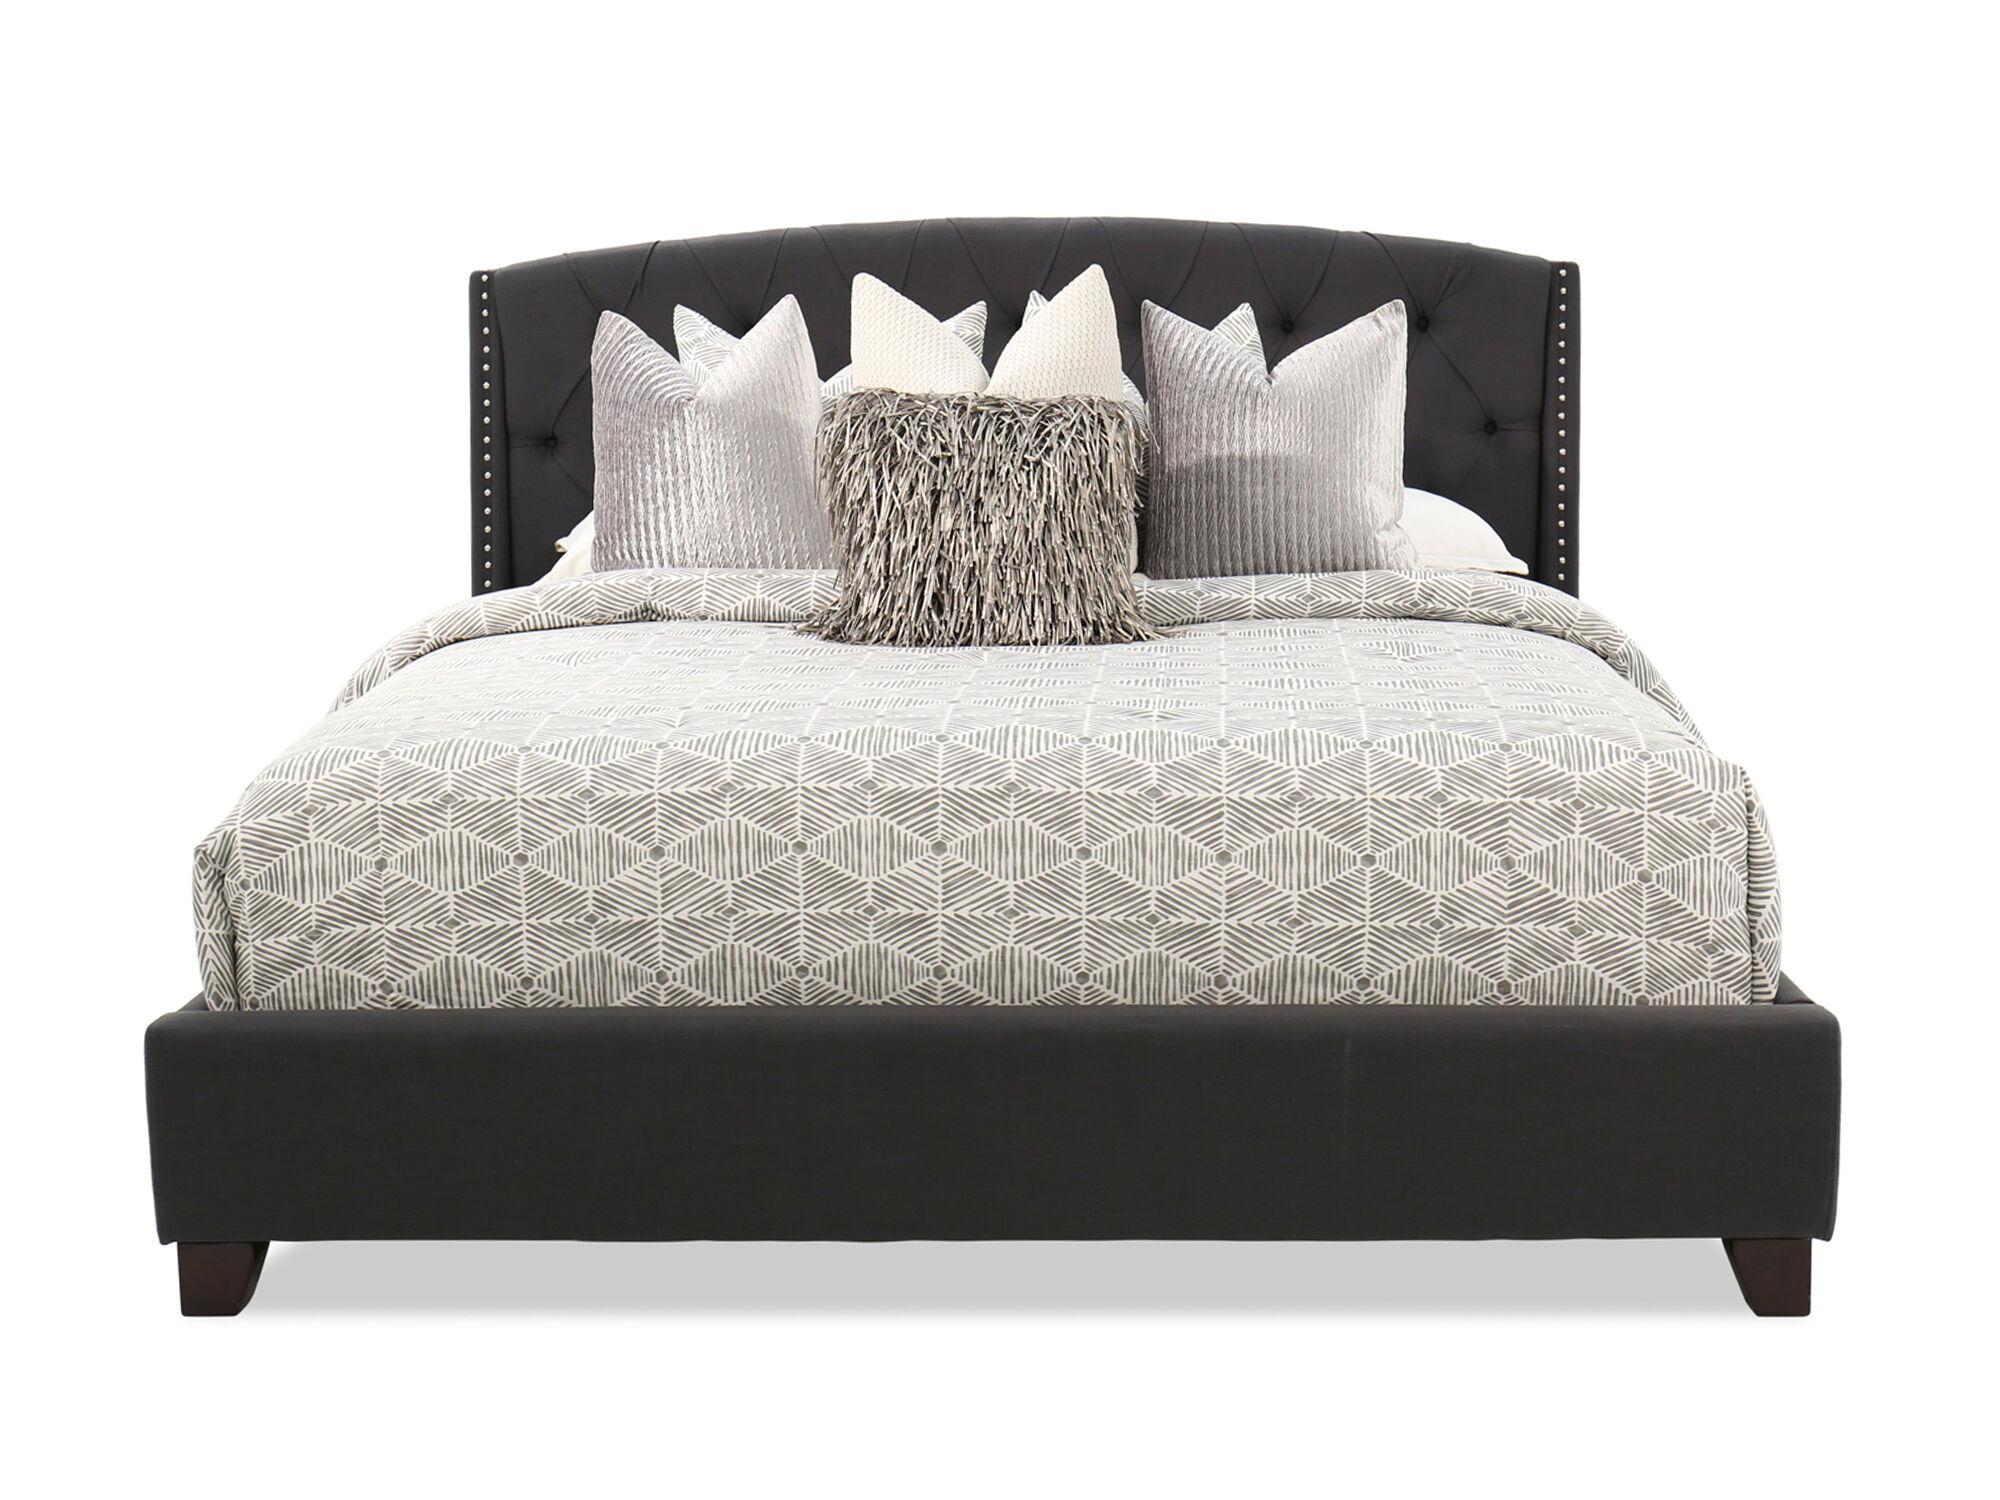 ashley kasidon dark gray tufted bed